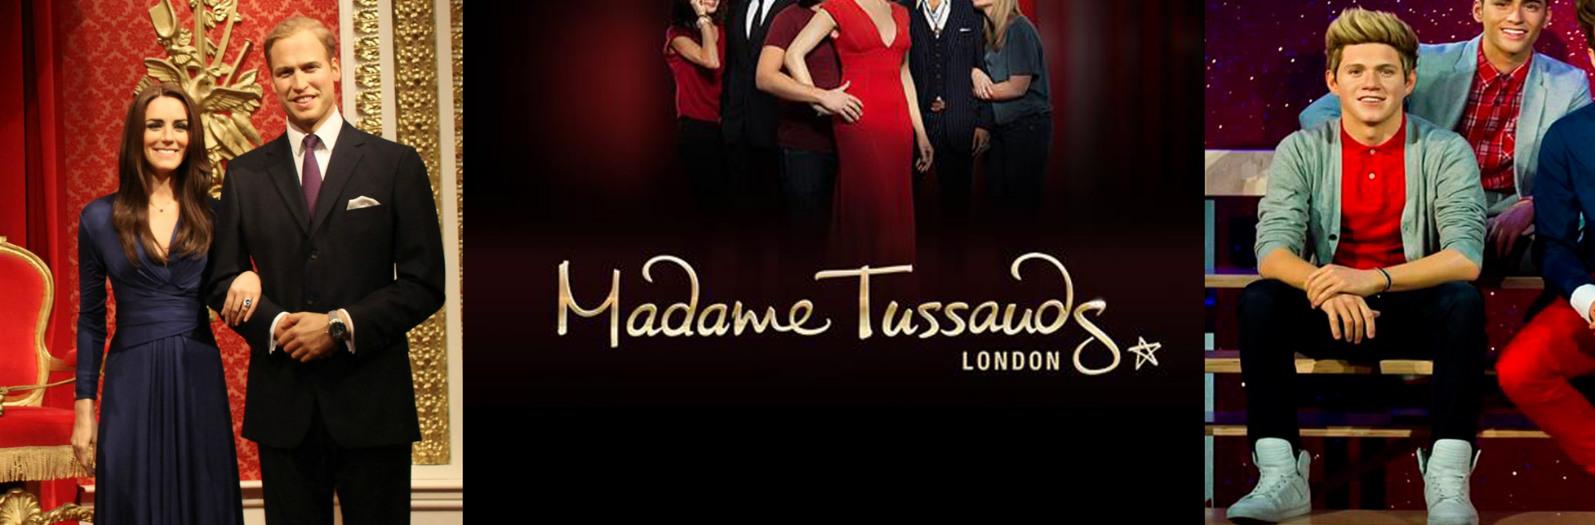 Madame Tussauds Londres Adarve Travel